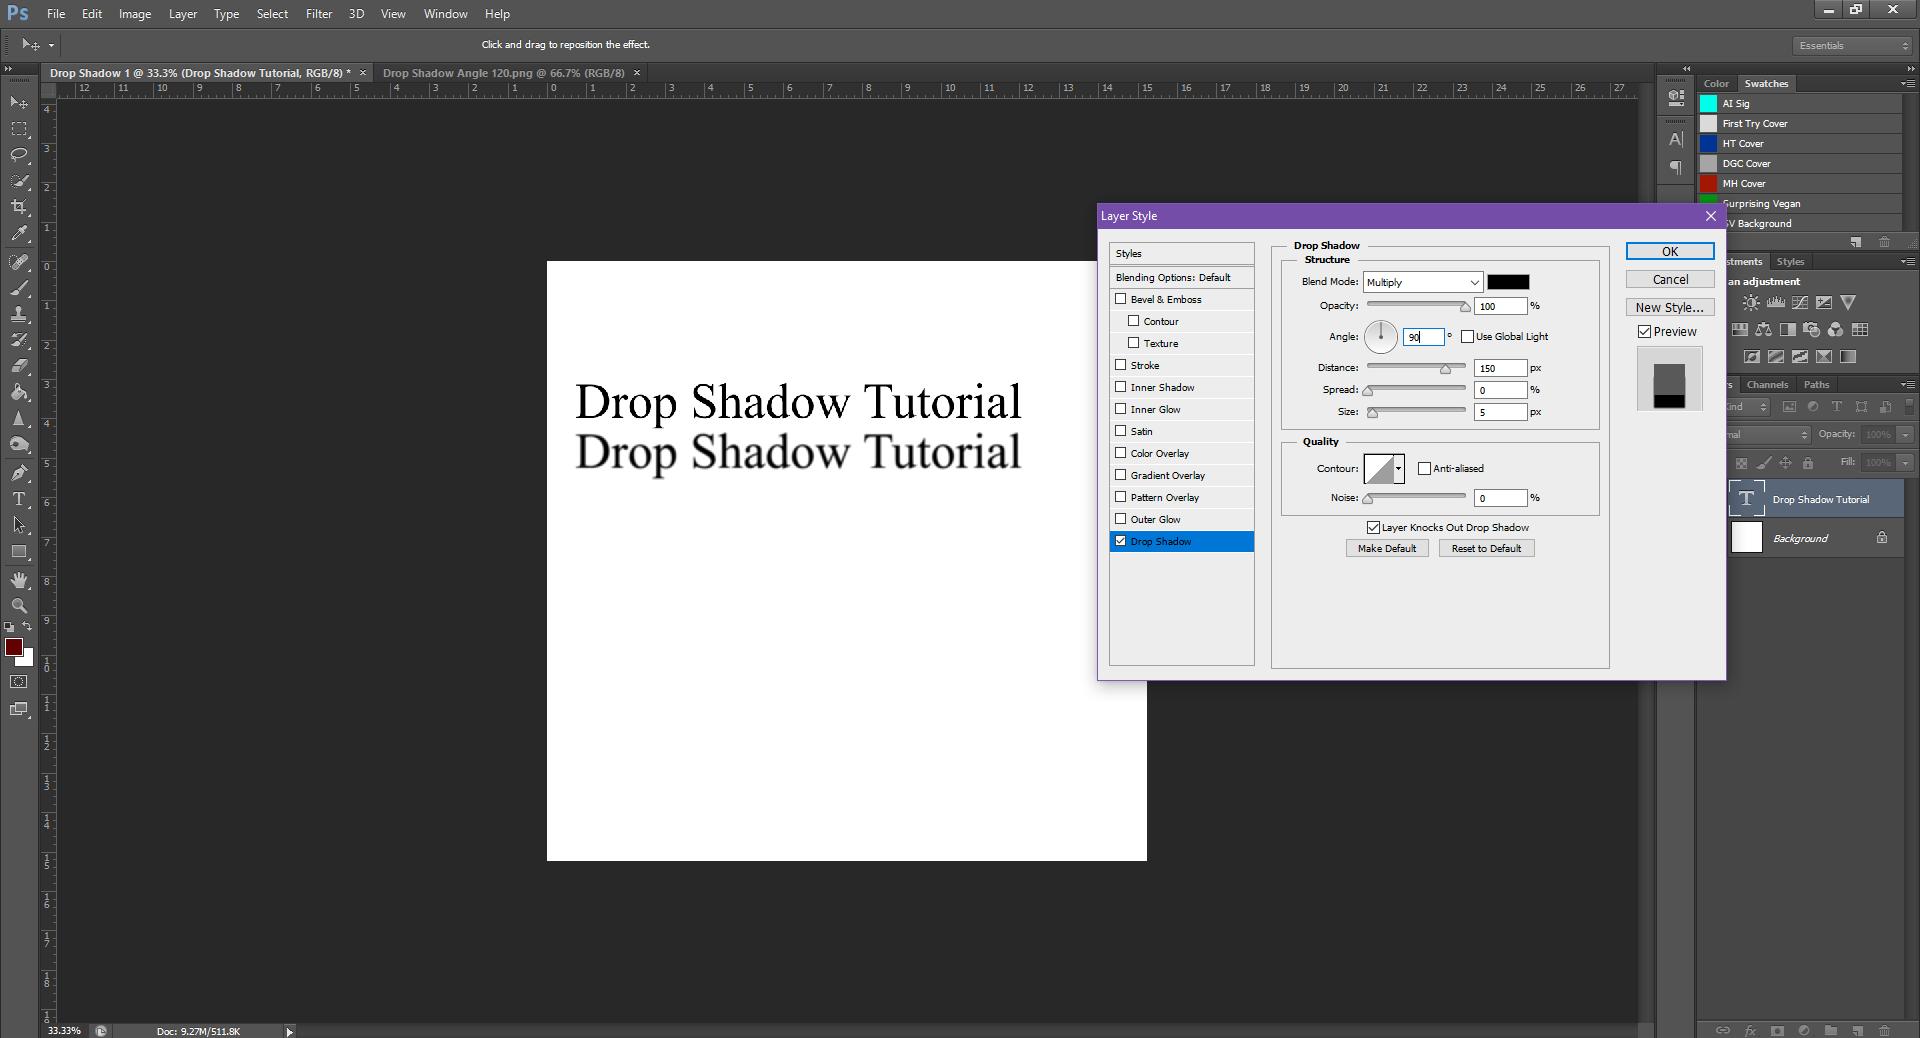 AterImber.com - Writing - Writing Tips - PHSH Tutorial - Drop Shadow - Angle 90